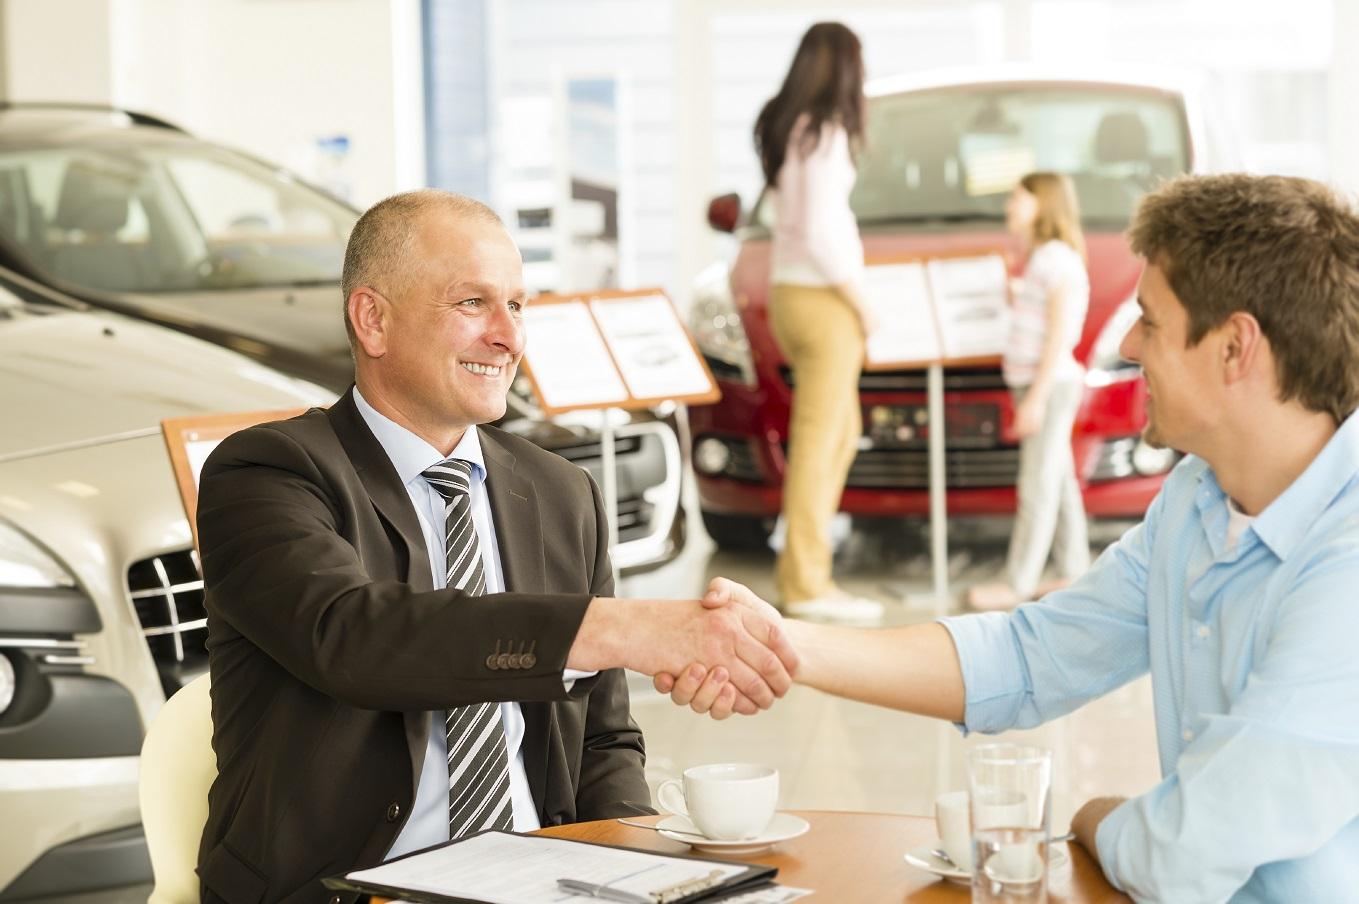 Used Cars For Sale By Owner Riyadh Saudi Arabia  Auto Soletcshat